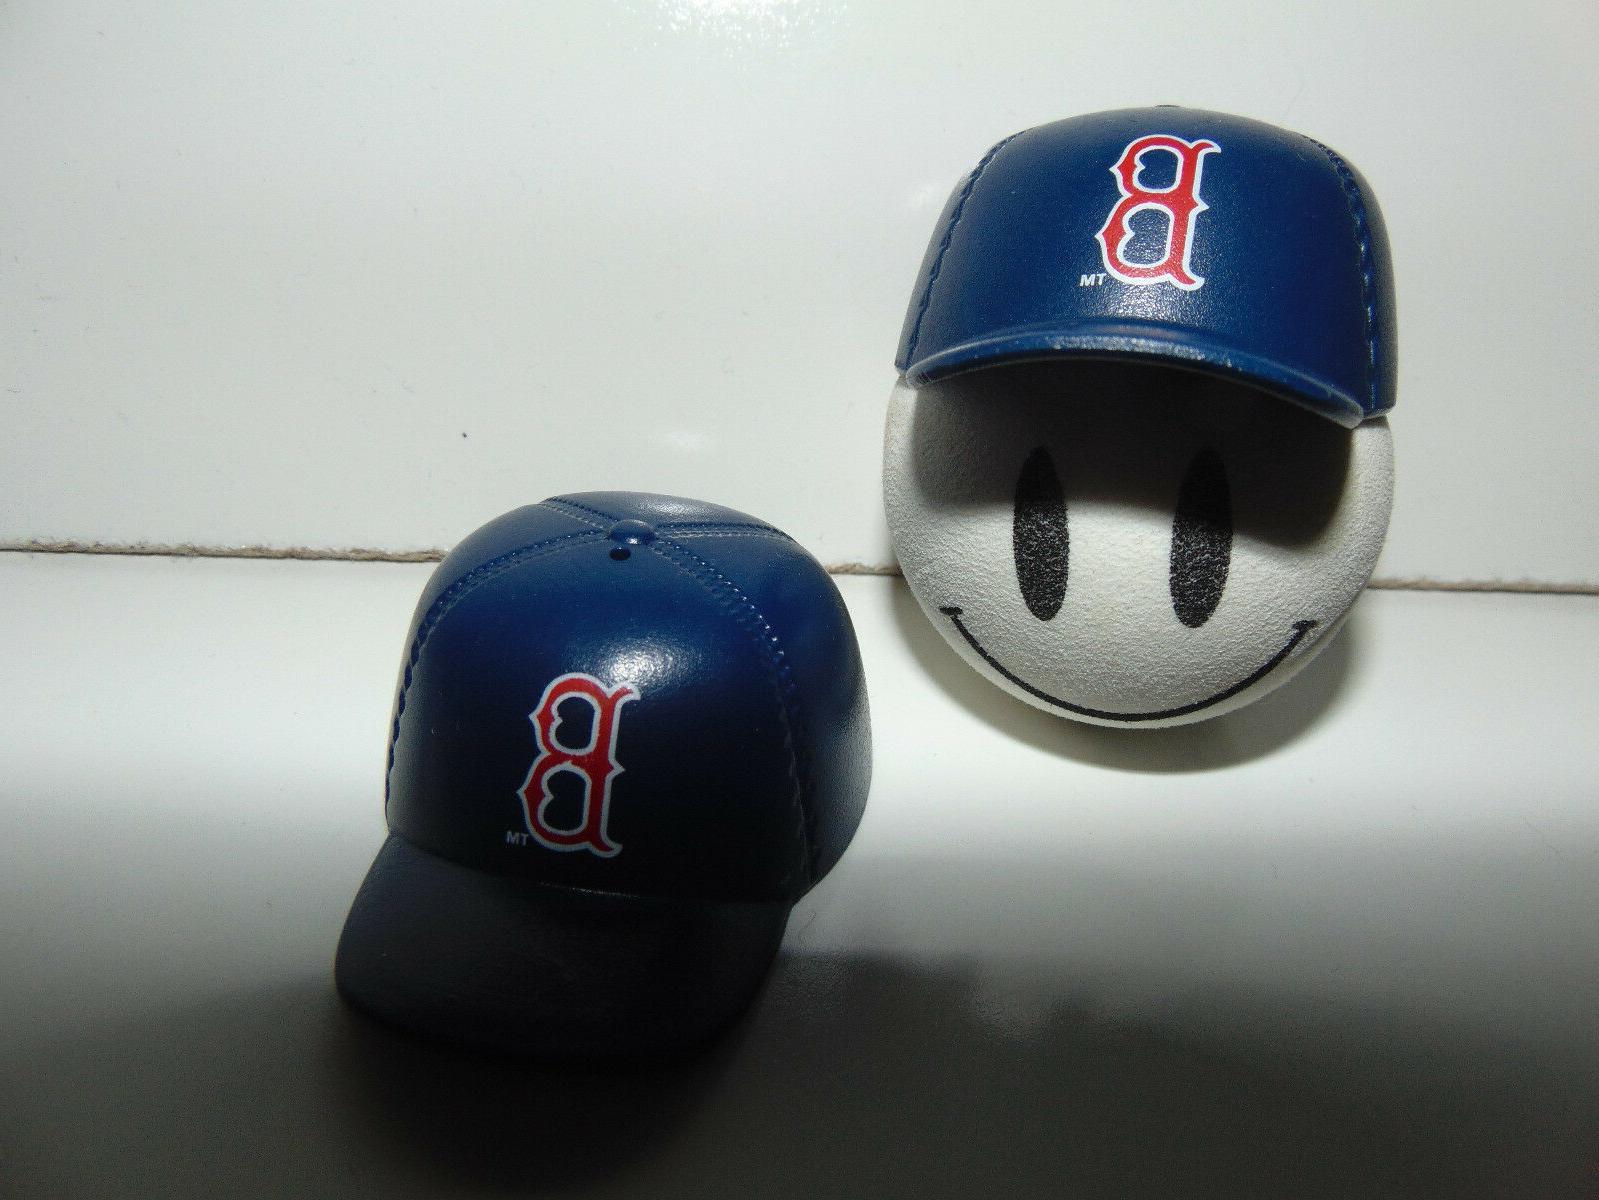 2 boston red sox antenna topper batting